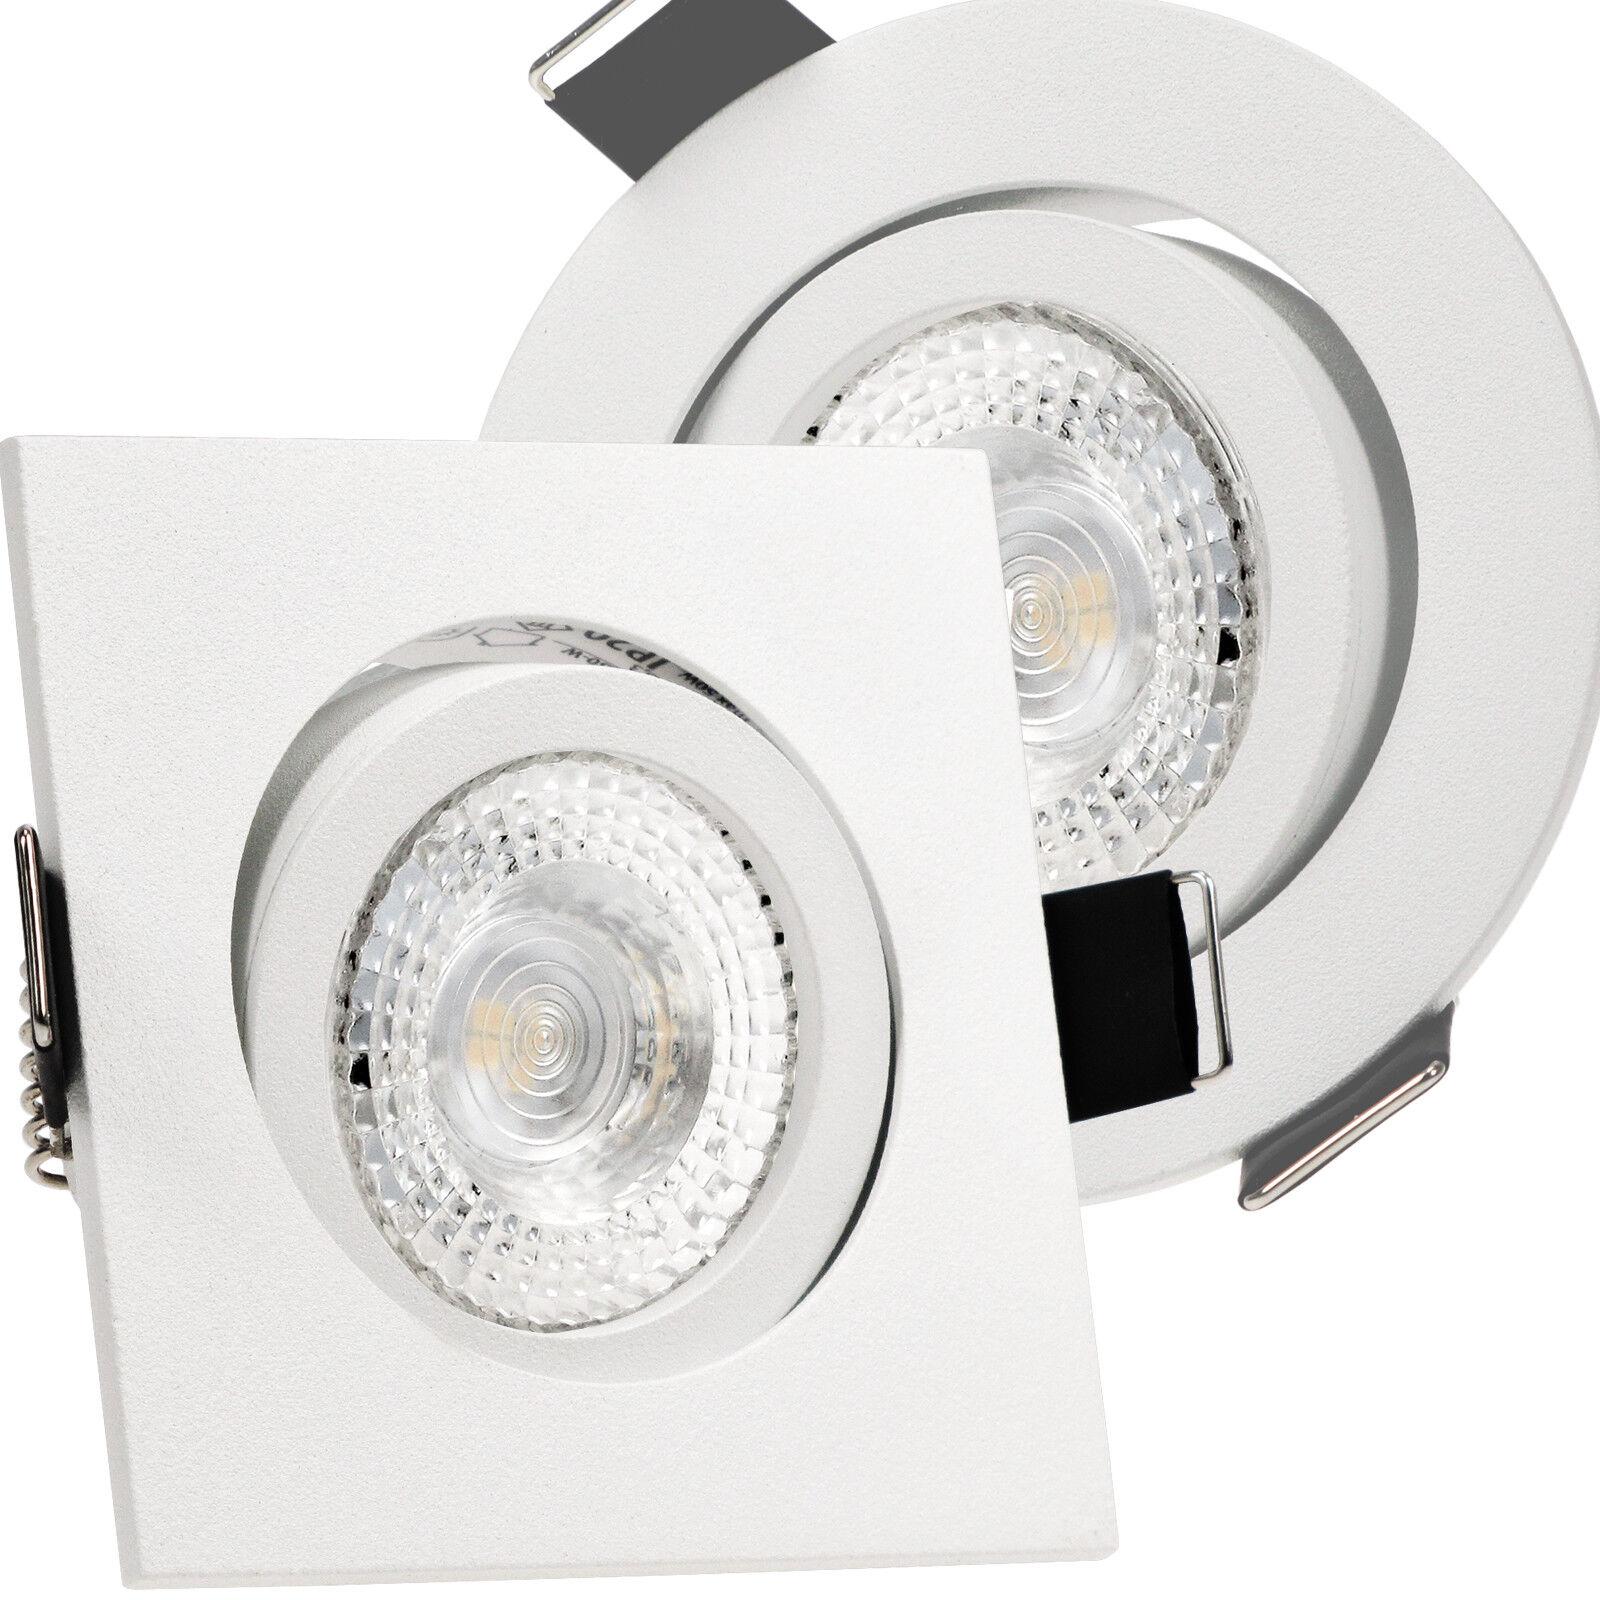 LED Einbauspots 230V SMD 3,3W=40W Hochvolt schwenkbar 1-50x AKTION Set BIANCO